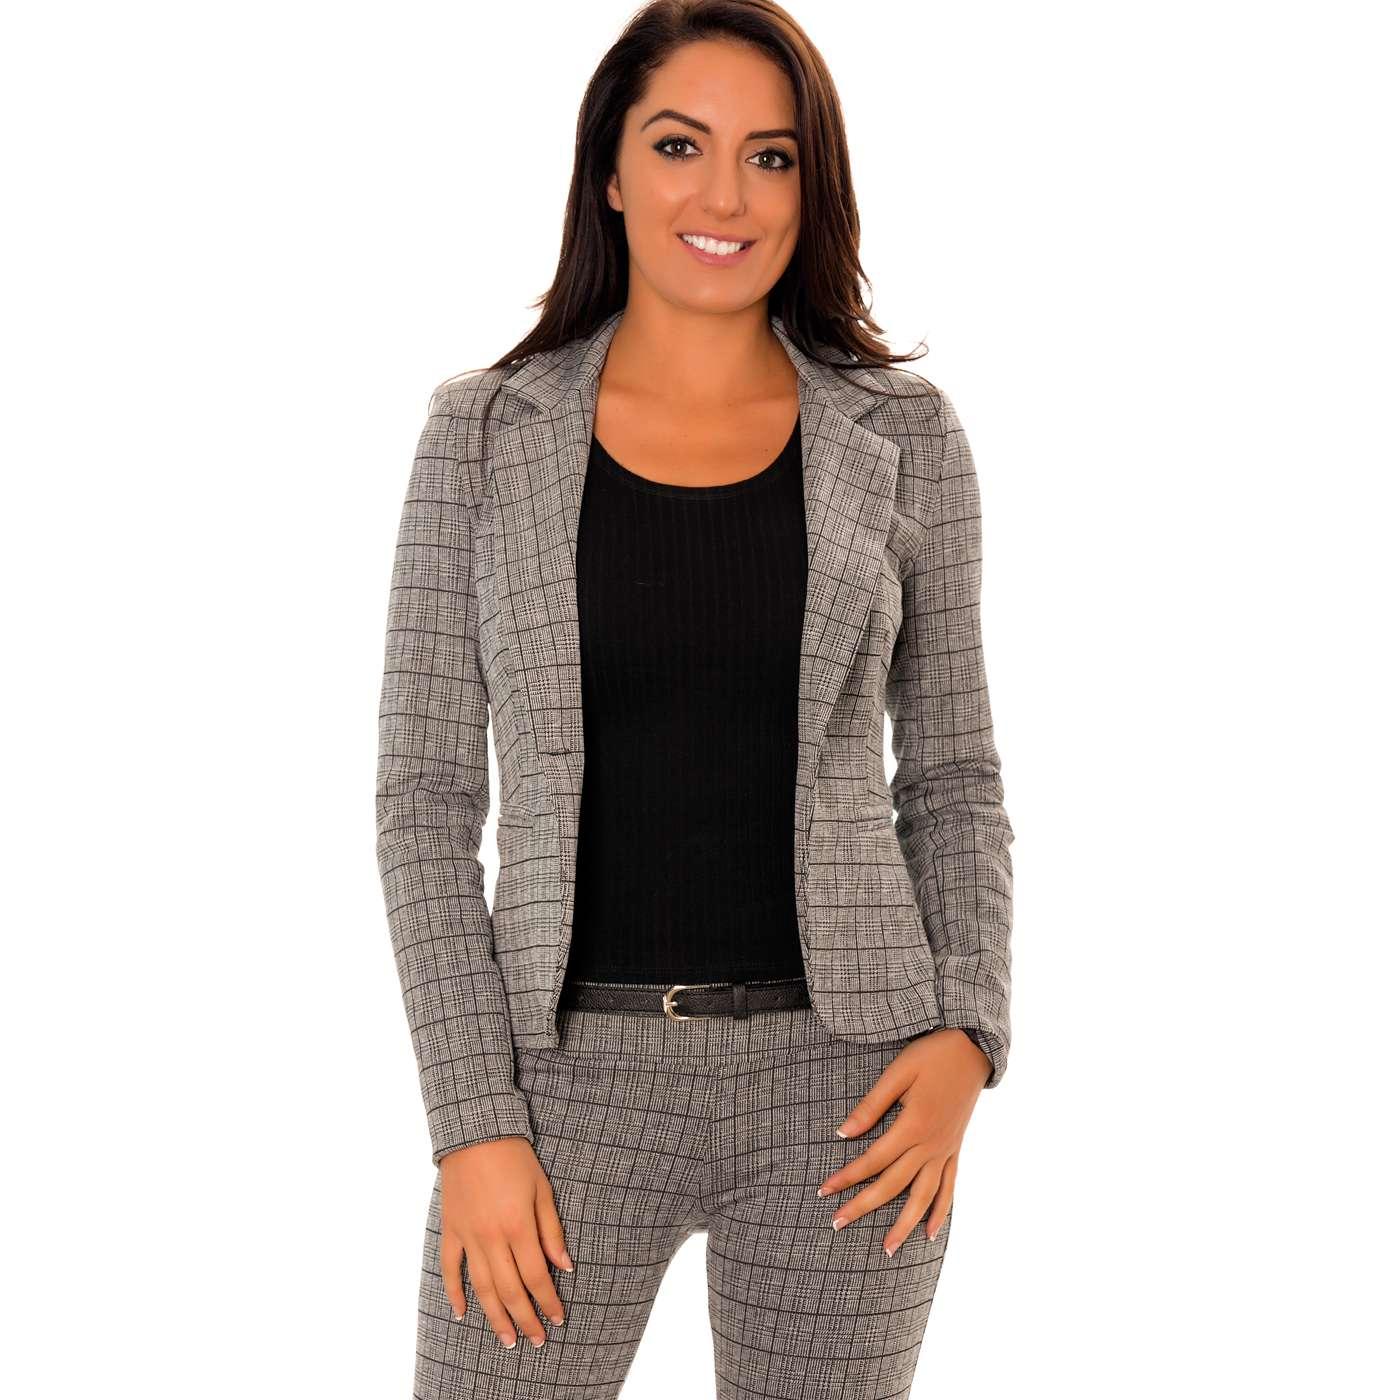 miss wear line veste blazer gris e carreau rayure noir veste femme. Black Bedroom Furniture Sets. Home Design Ideas